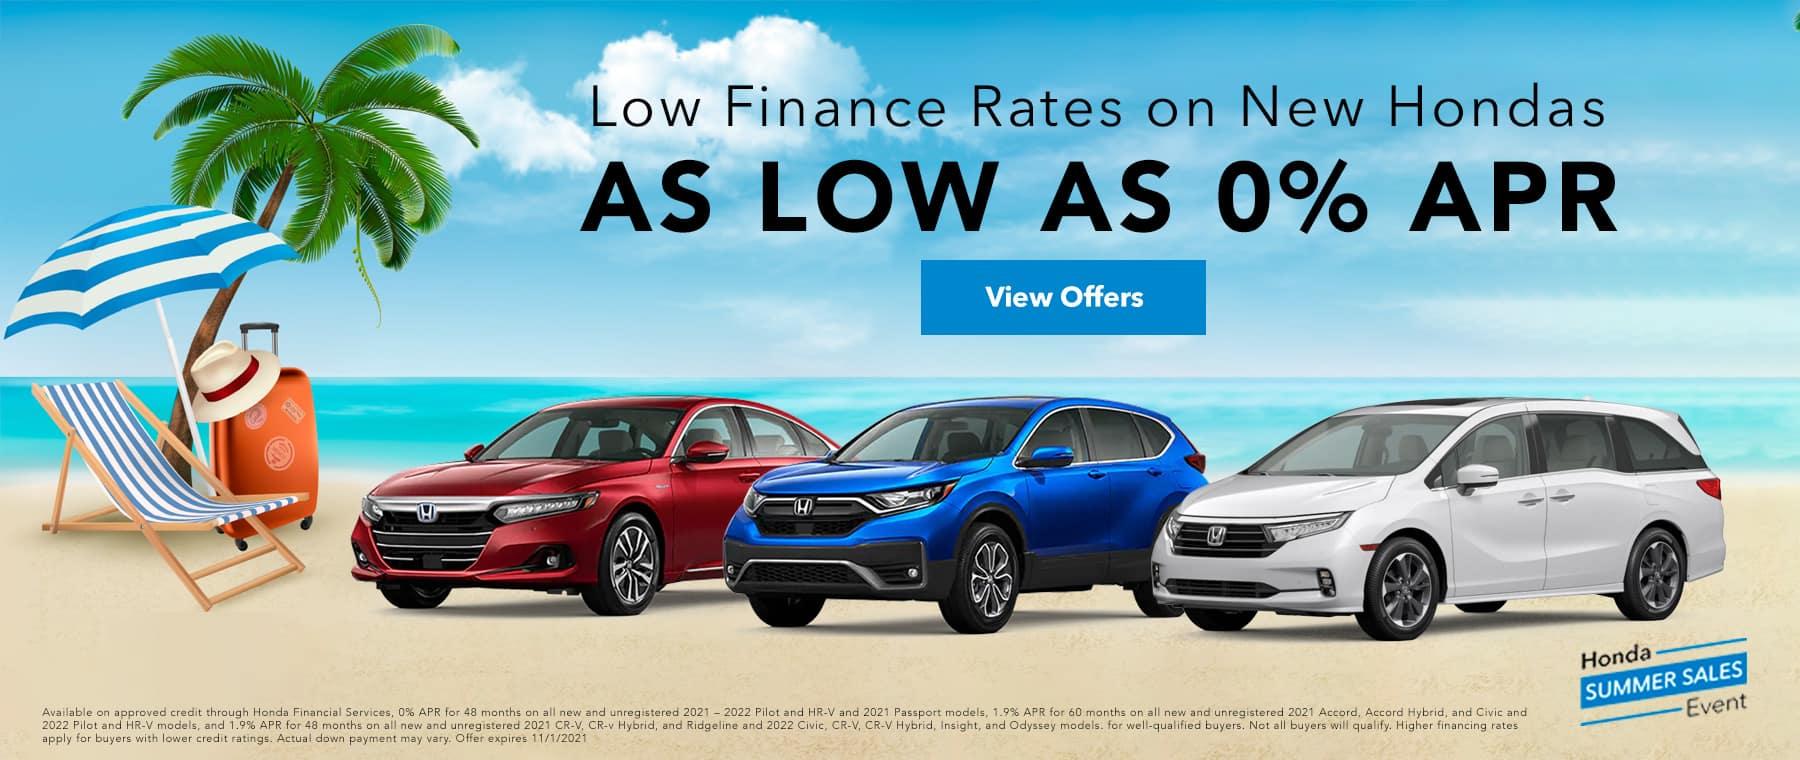 New Hondas as low as 0%APR